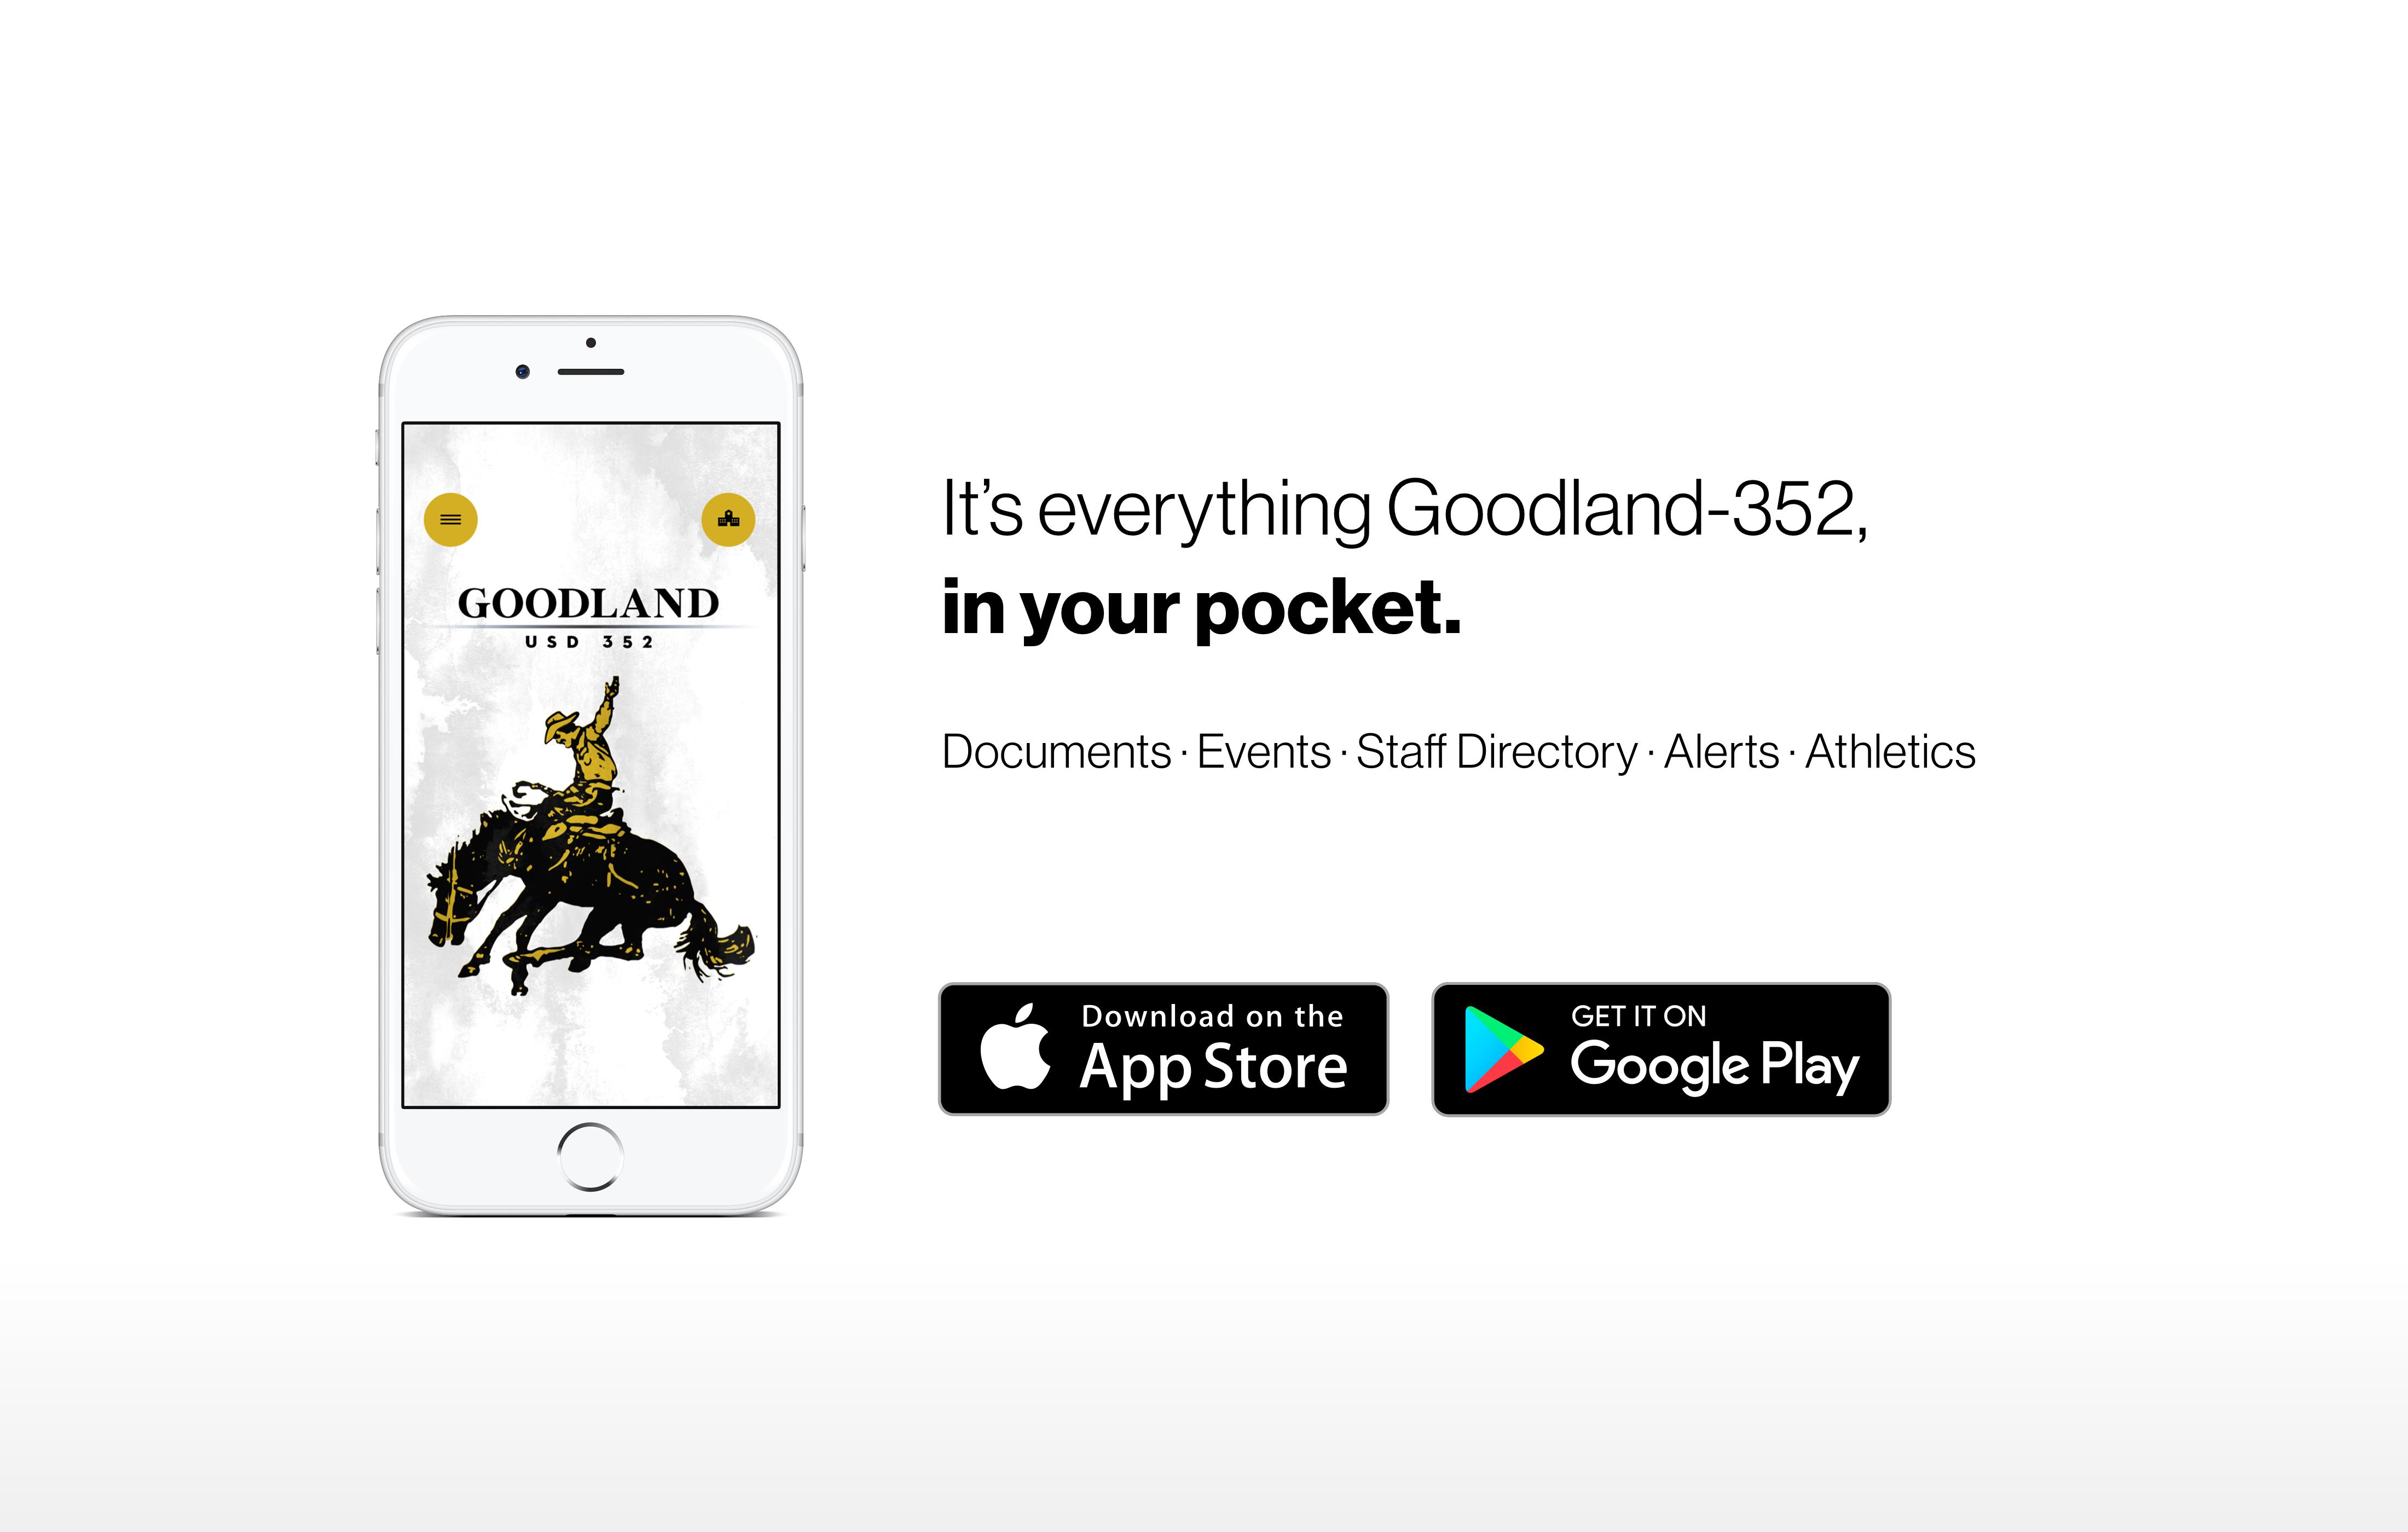 Goodland-352 App